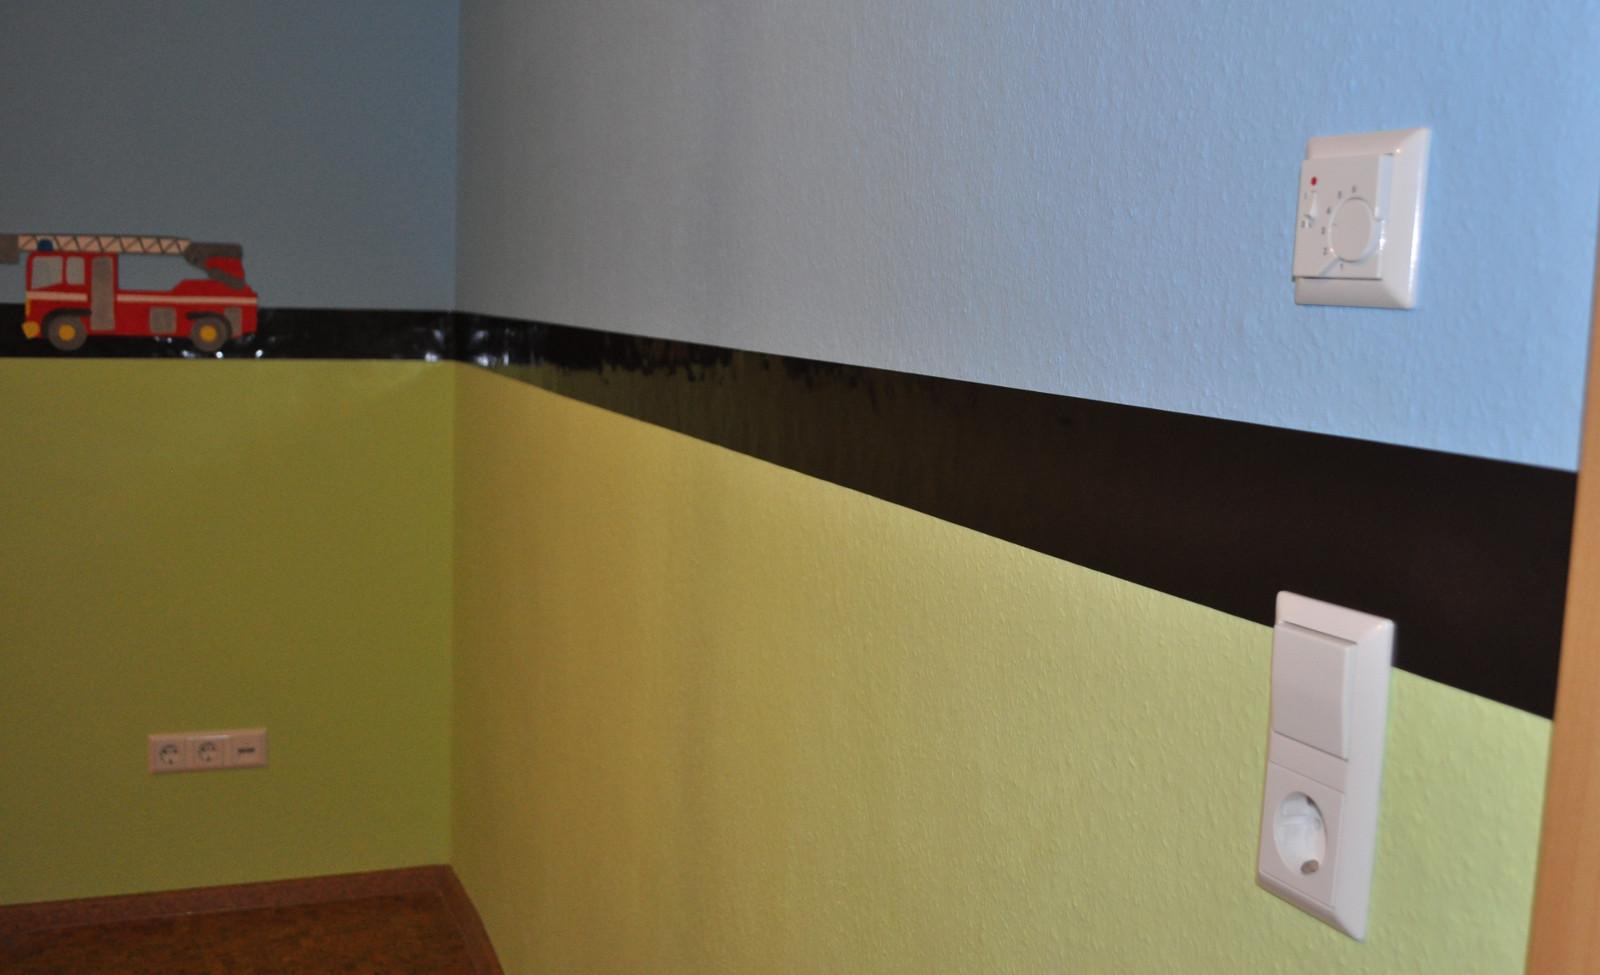 bewegliches wandbild f rs kinderzimmer. Black Bedroom Furniture Sets. Home Design Ideas